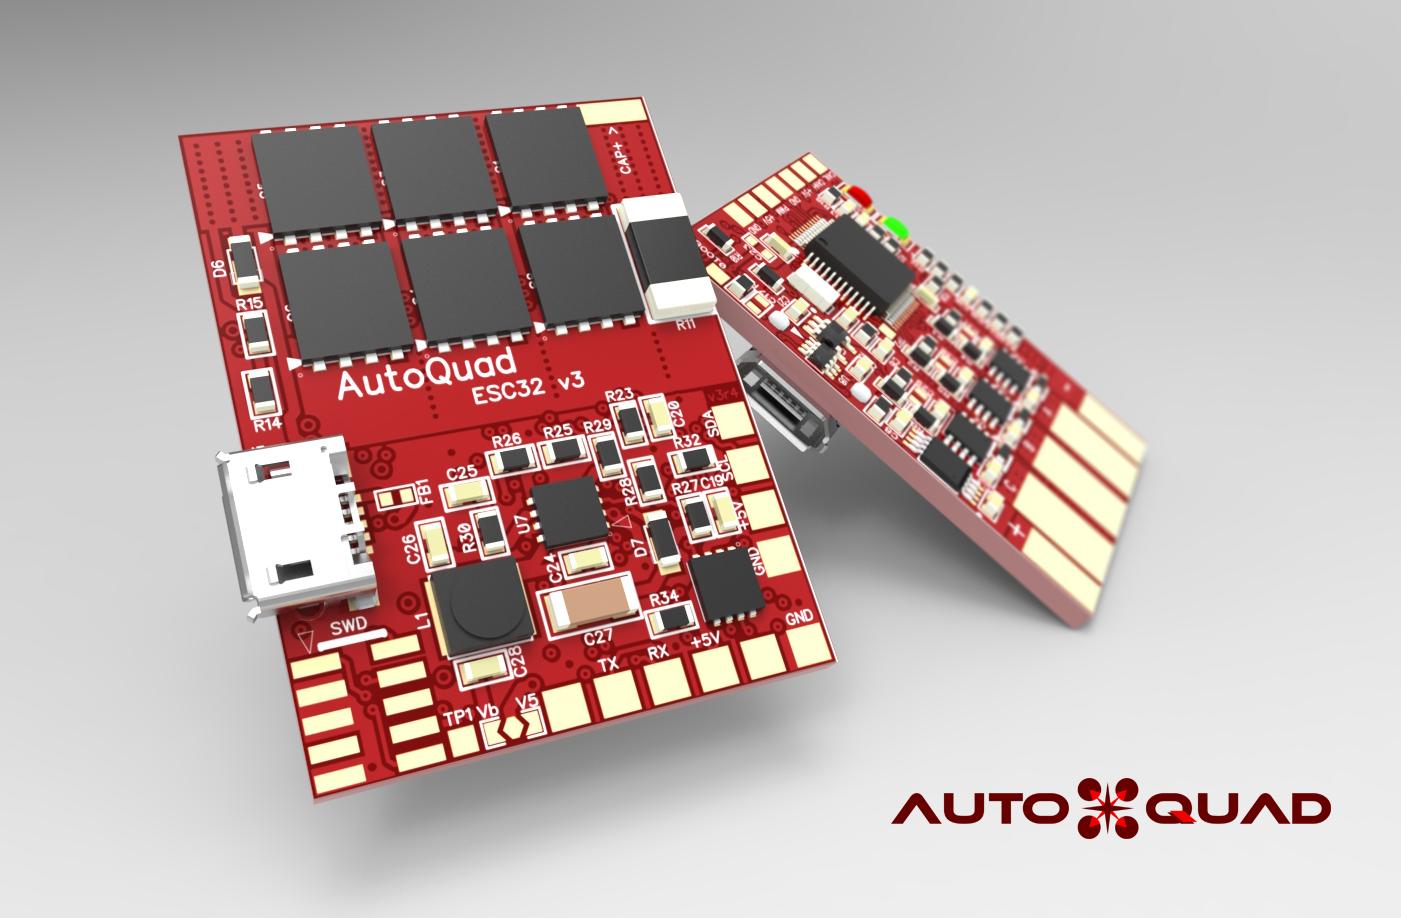 AutoQuad ESC32 V3 electronic Speed Controller